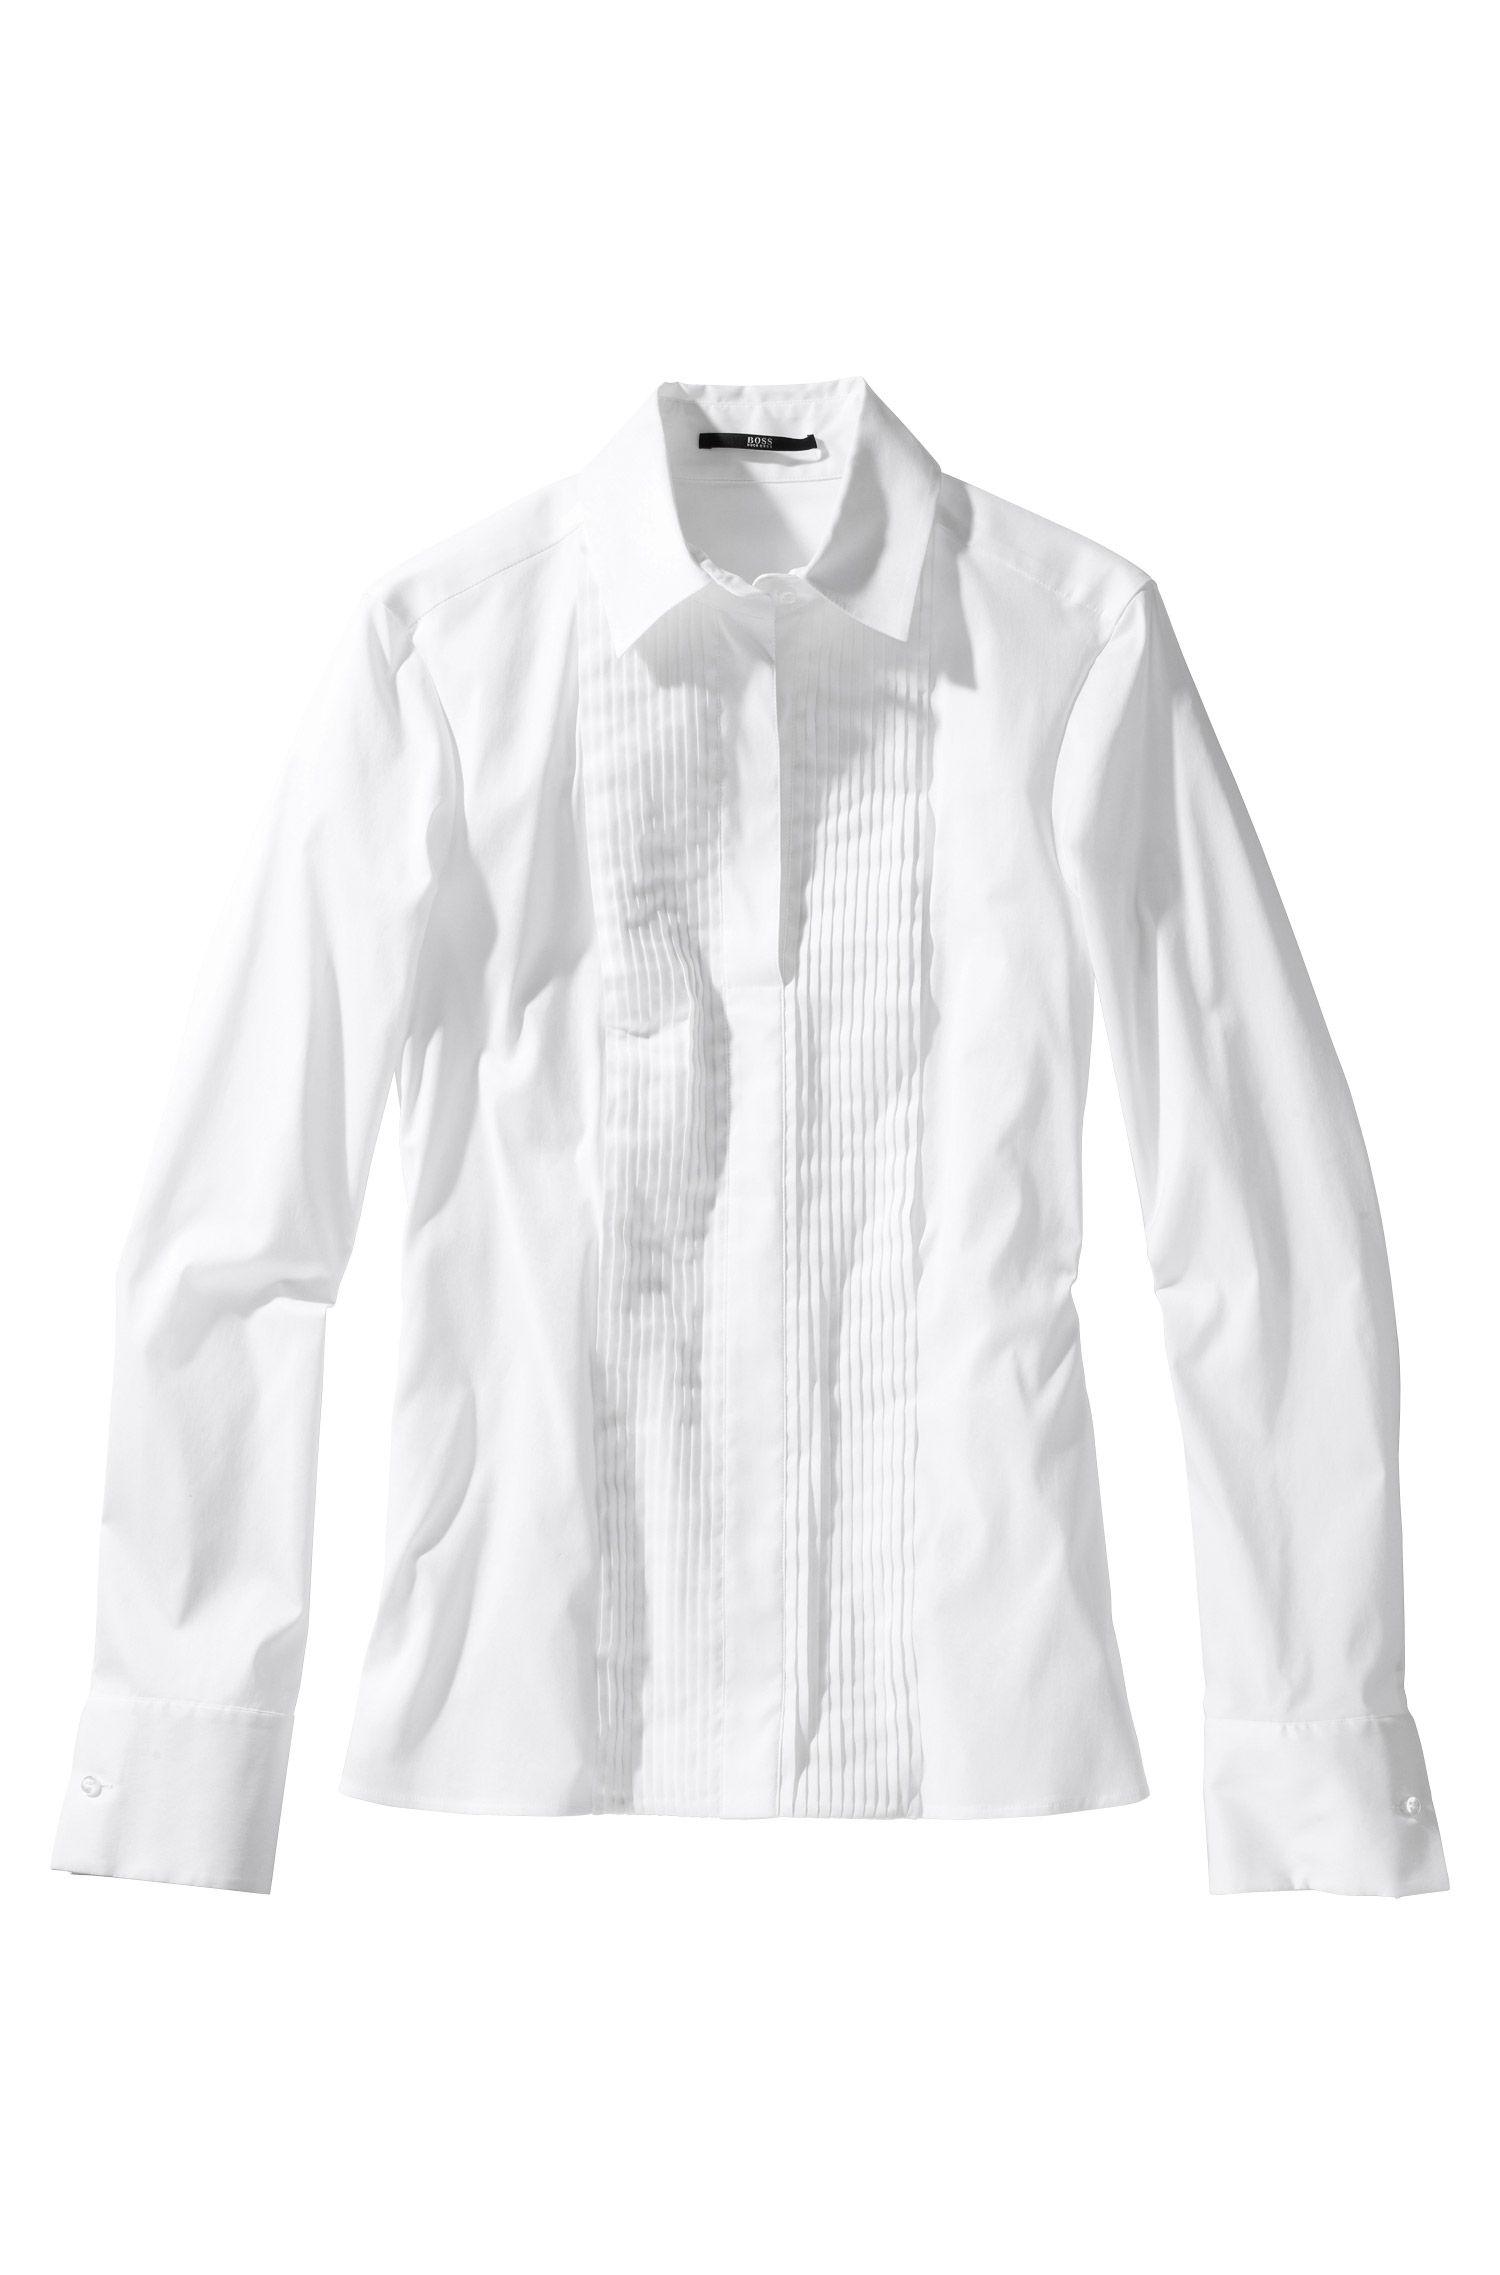 Fashion-Bluse ´Bashino` mit Plisee-Plastron